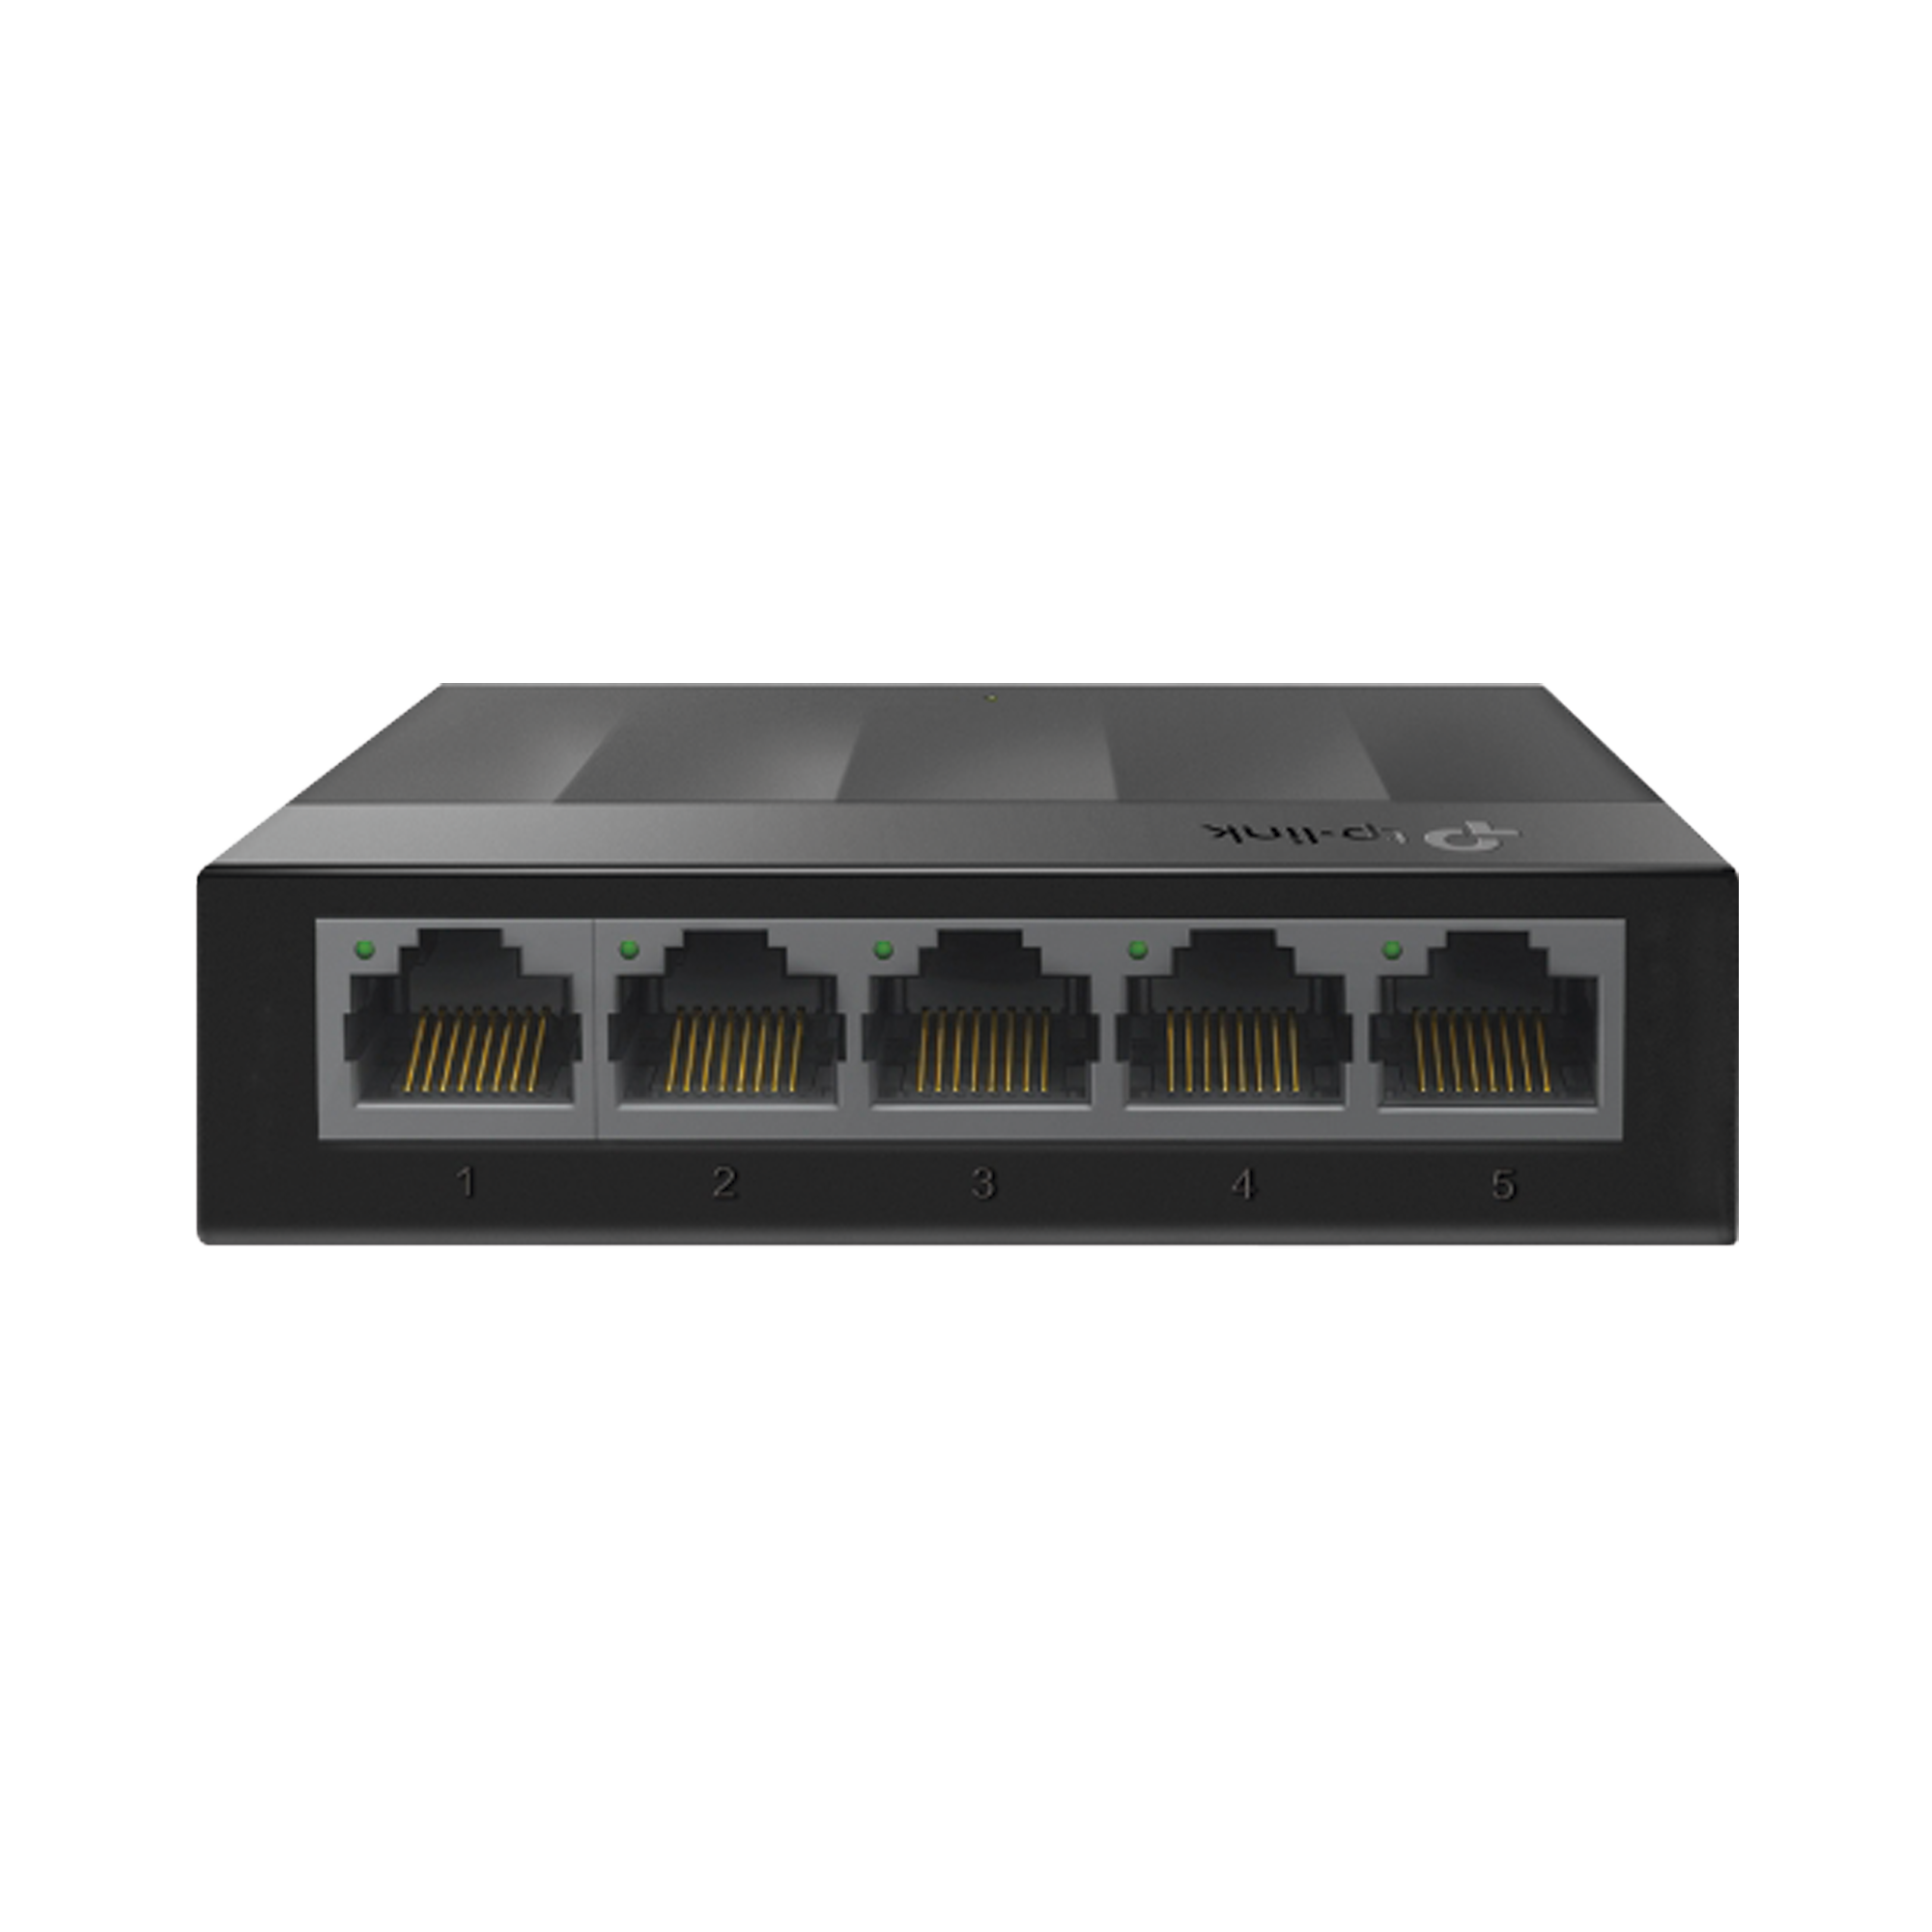 Switch para escritorio 5 puertos 10/100/1000Mbps